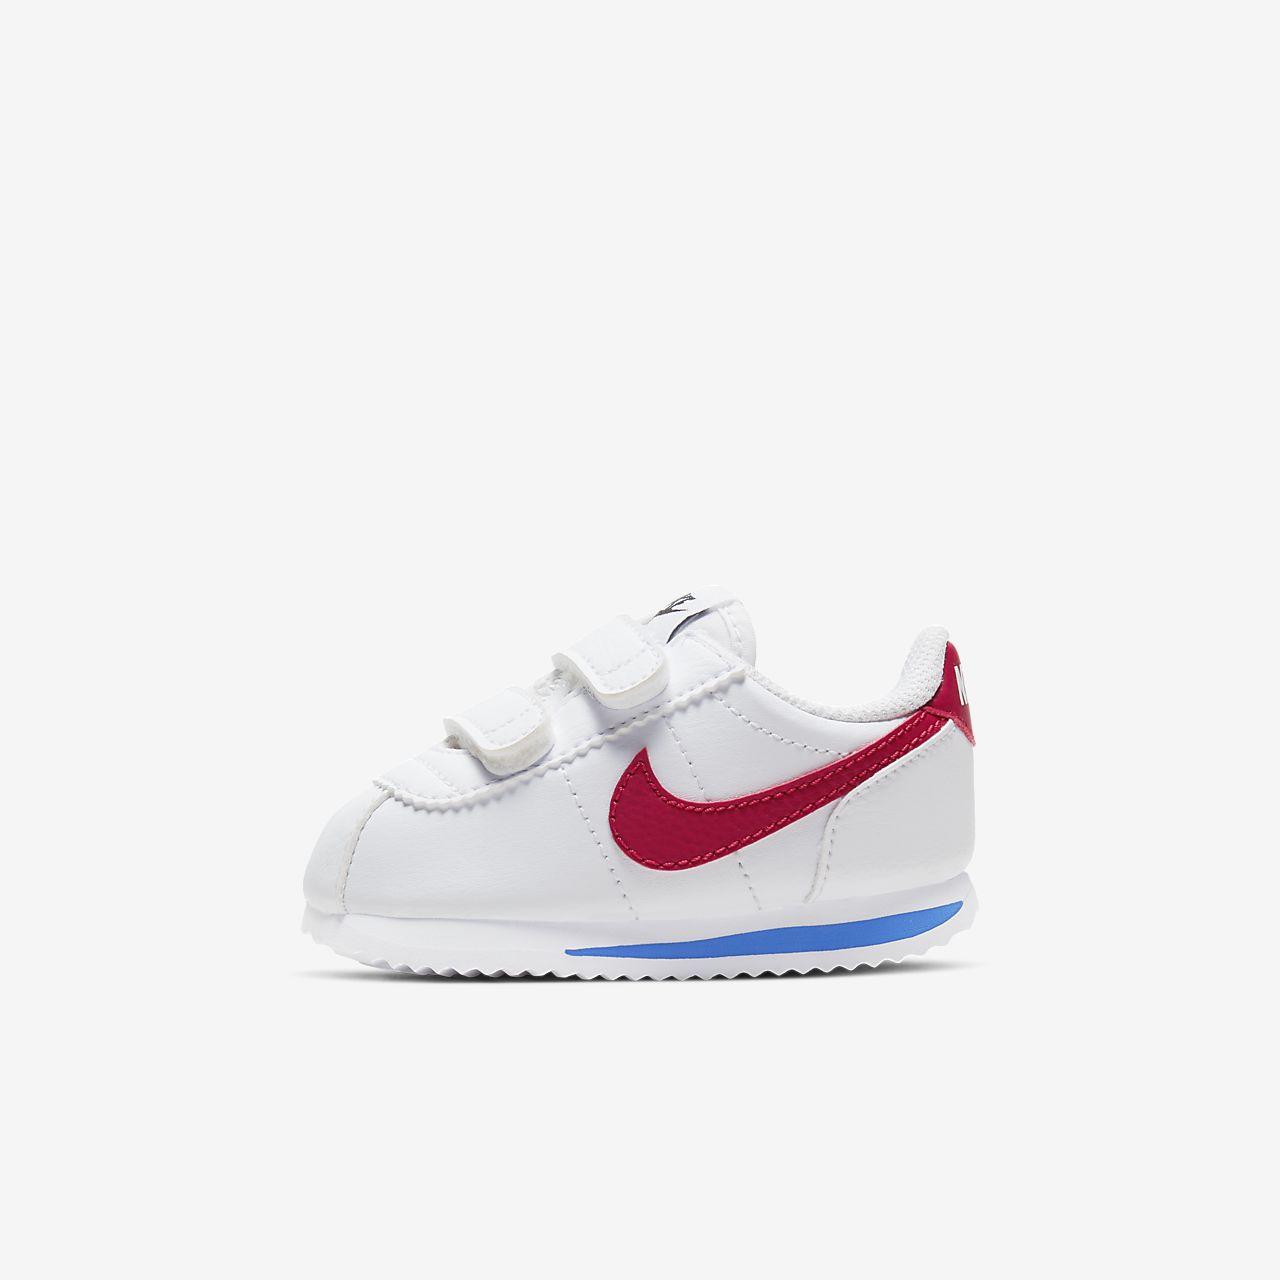 8cd4a0a2e82 Nike Cortez Basic SL Baby   Toddler Shoe. Nike.com ID